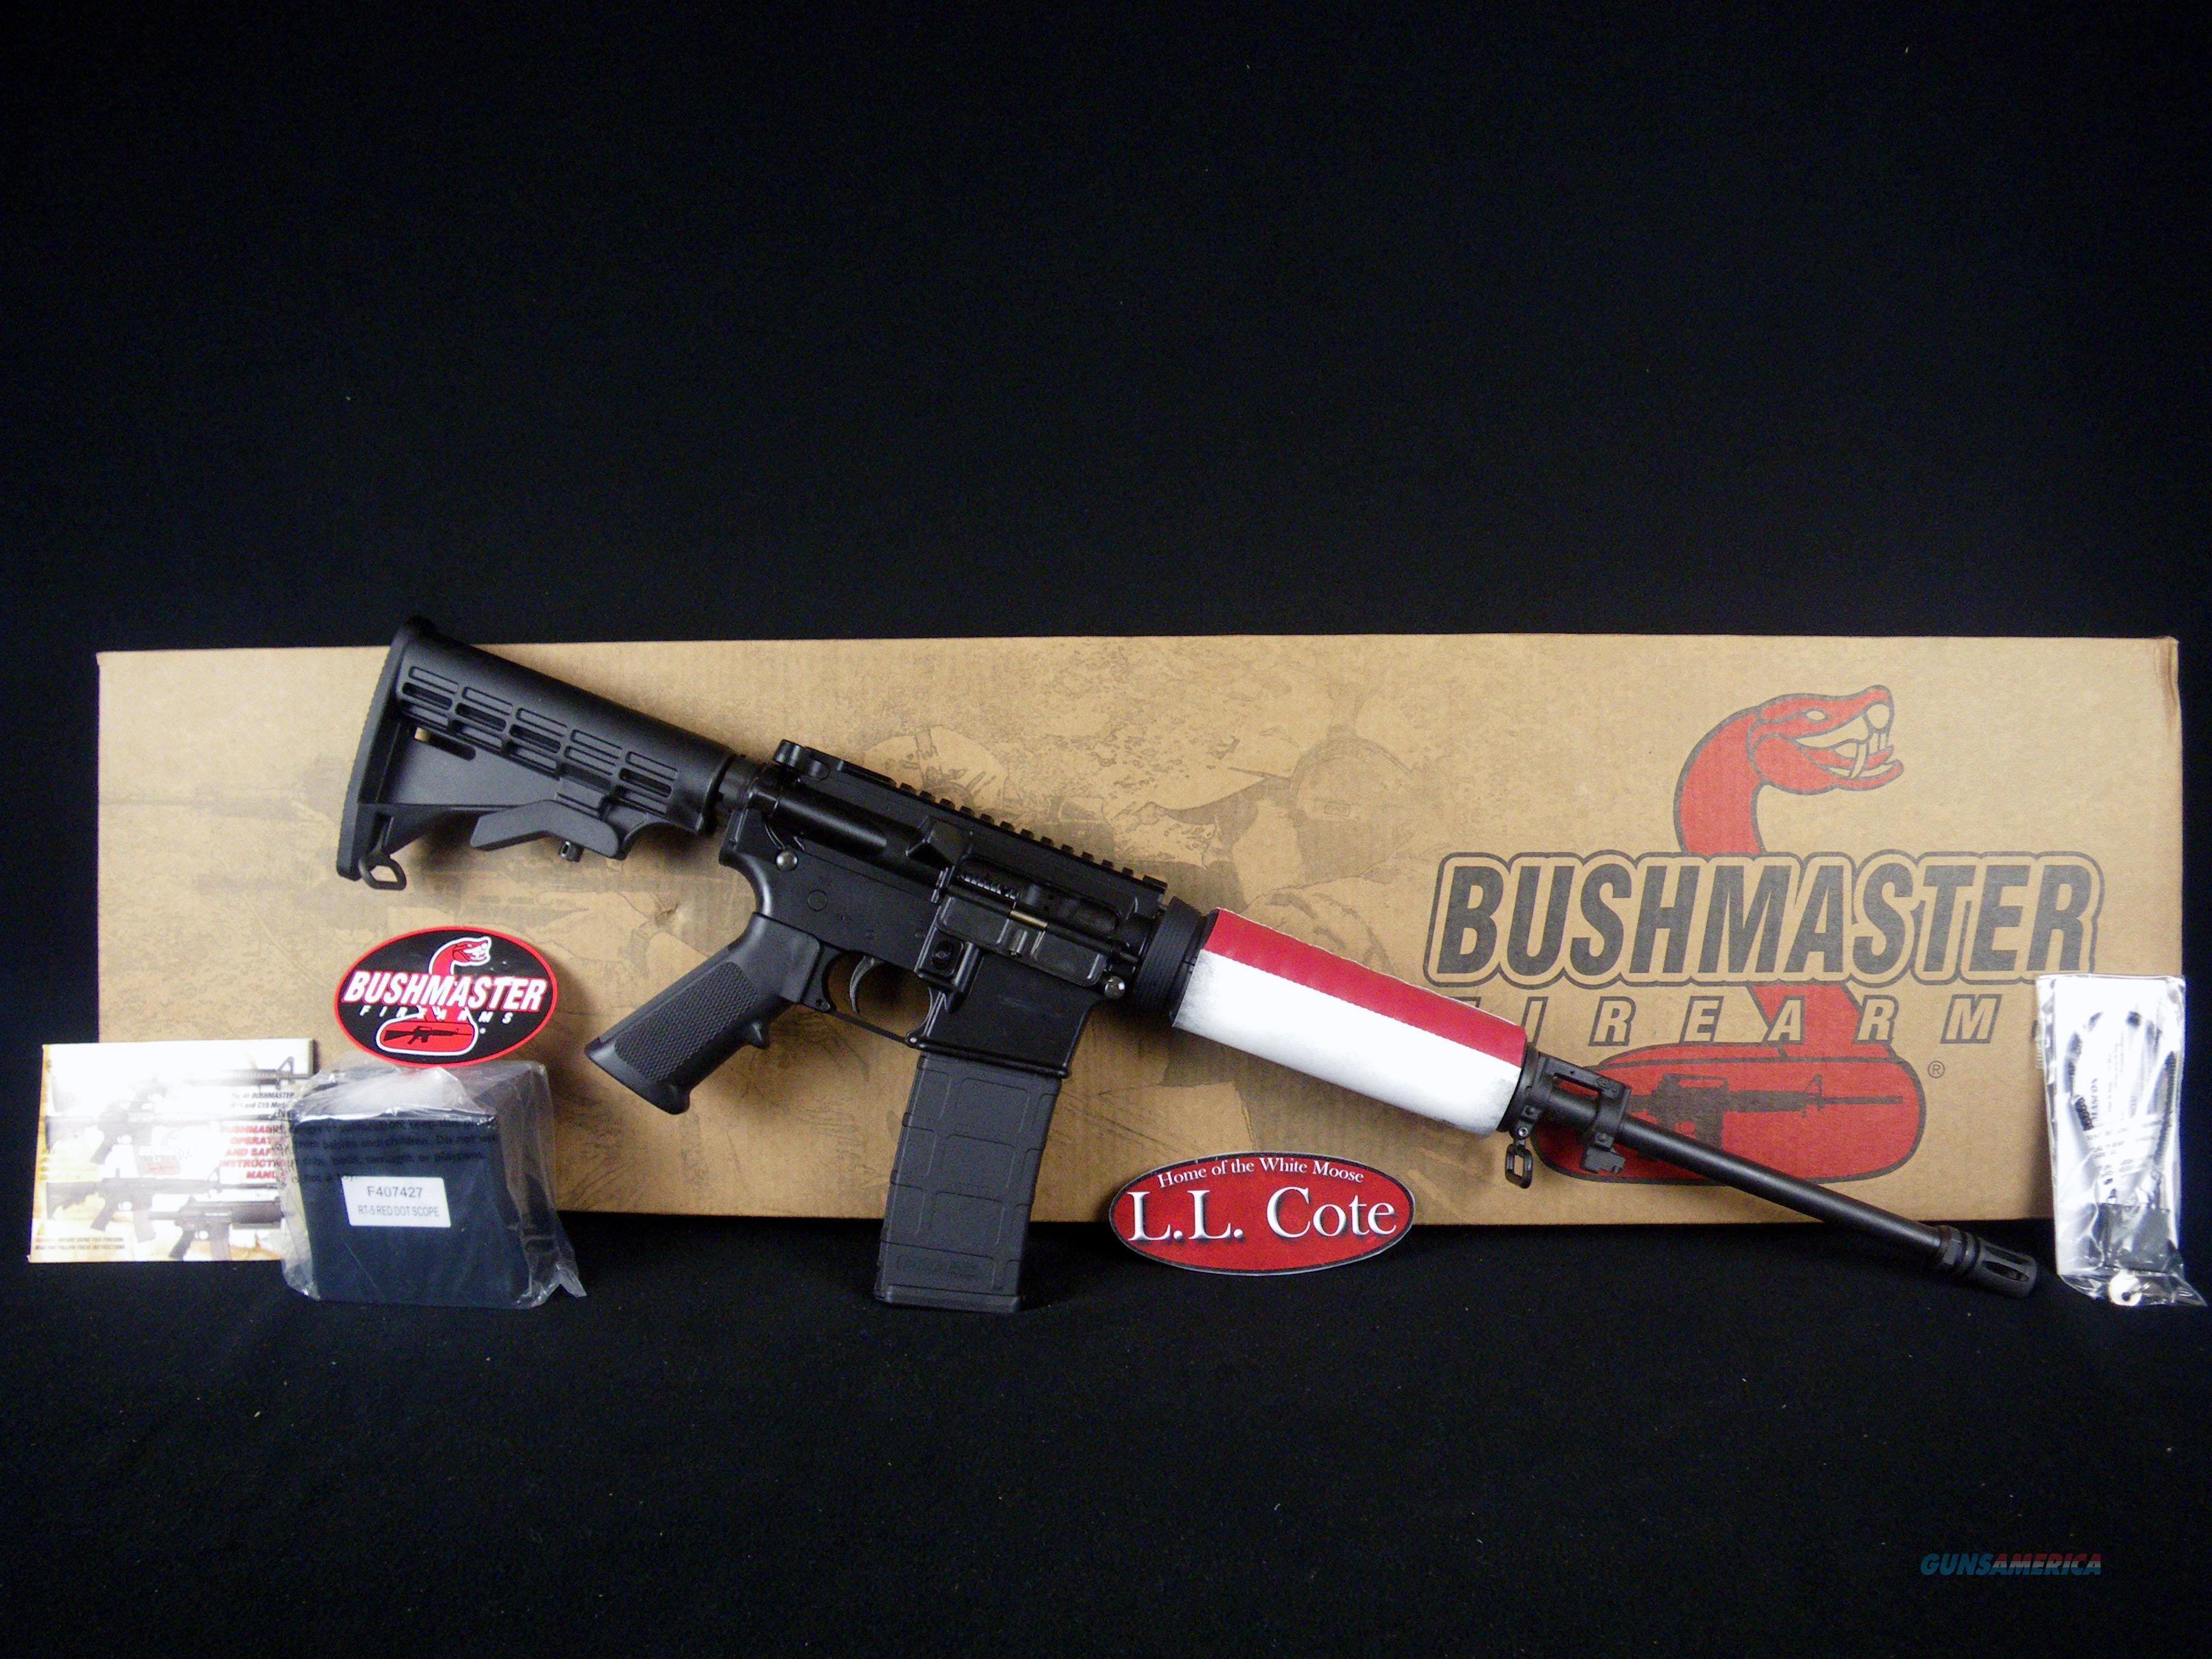 "Bushmaster XM-15 QRC 5.56 Nato 16"" AR15 NEW 91046  Guns > Rifles > Bushmaster Rifles > Complete Rifles"